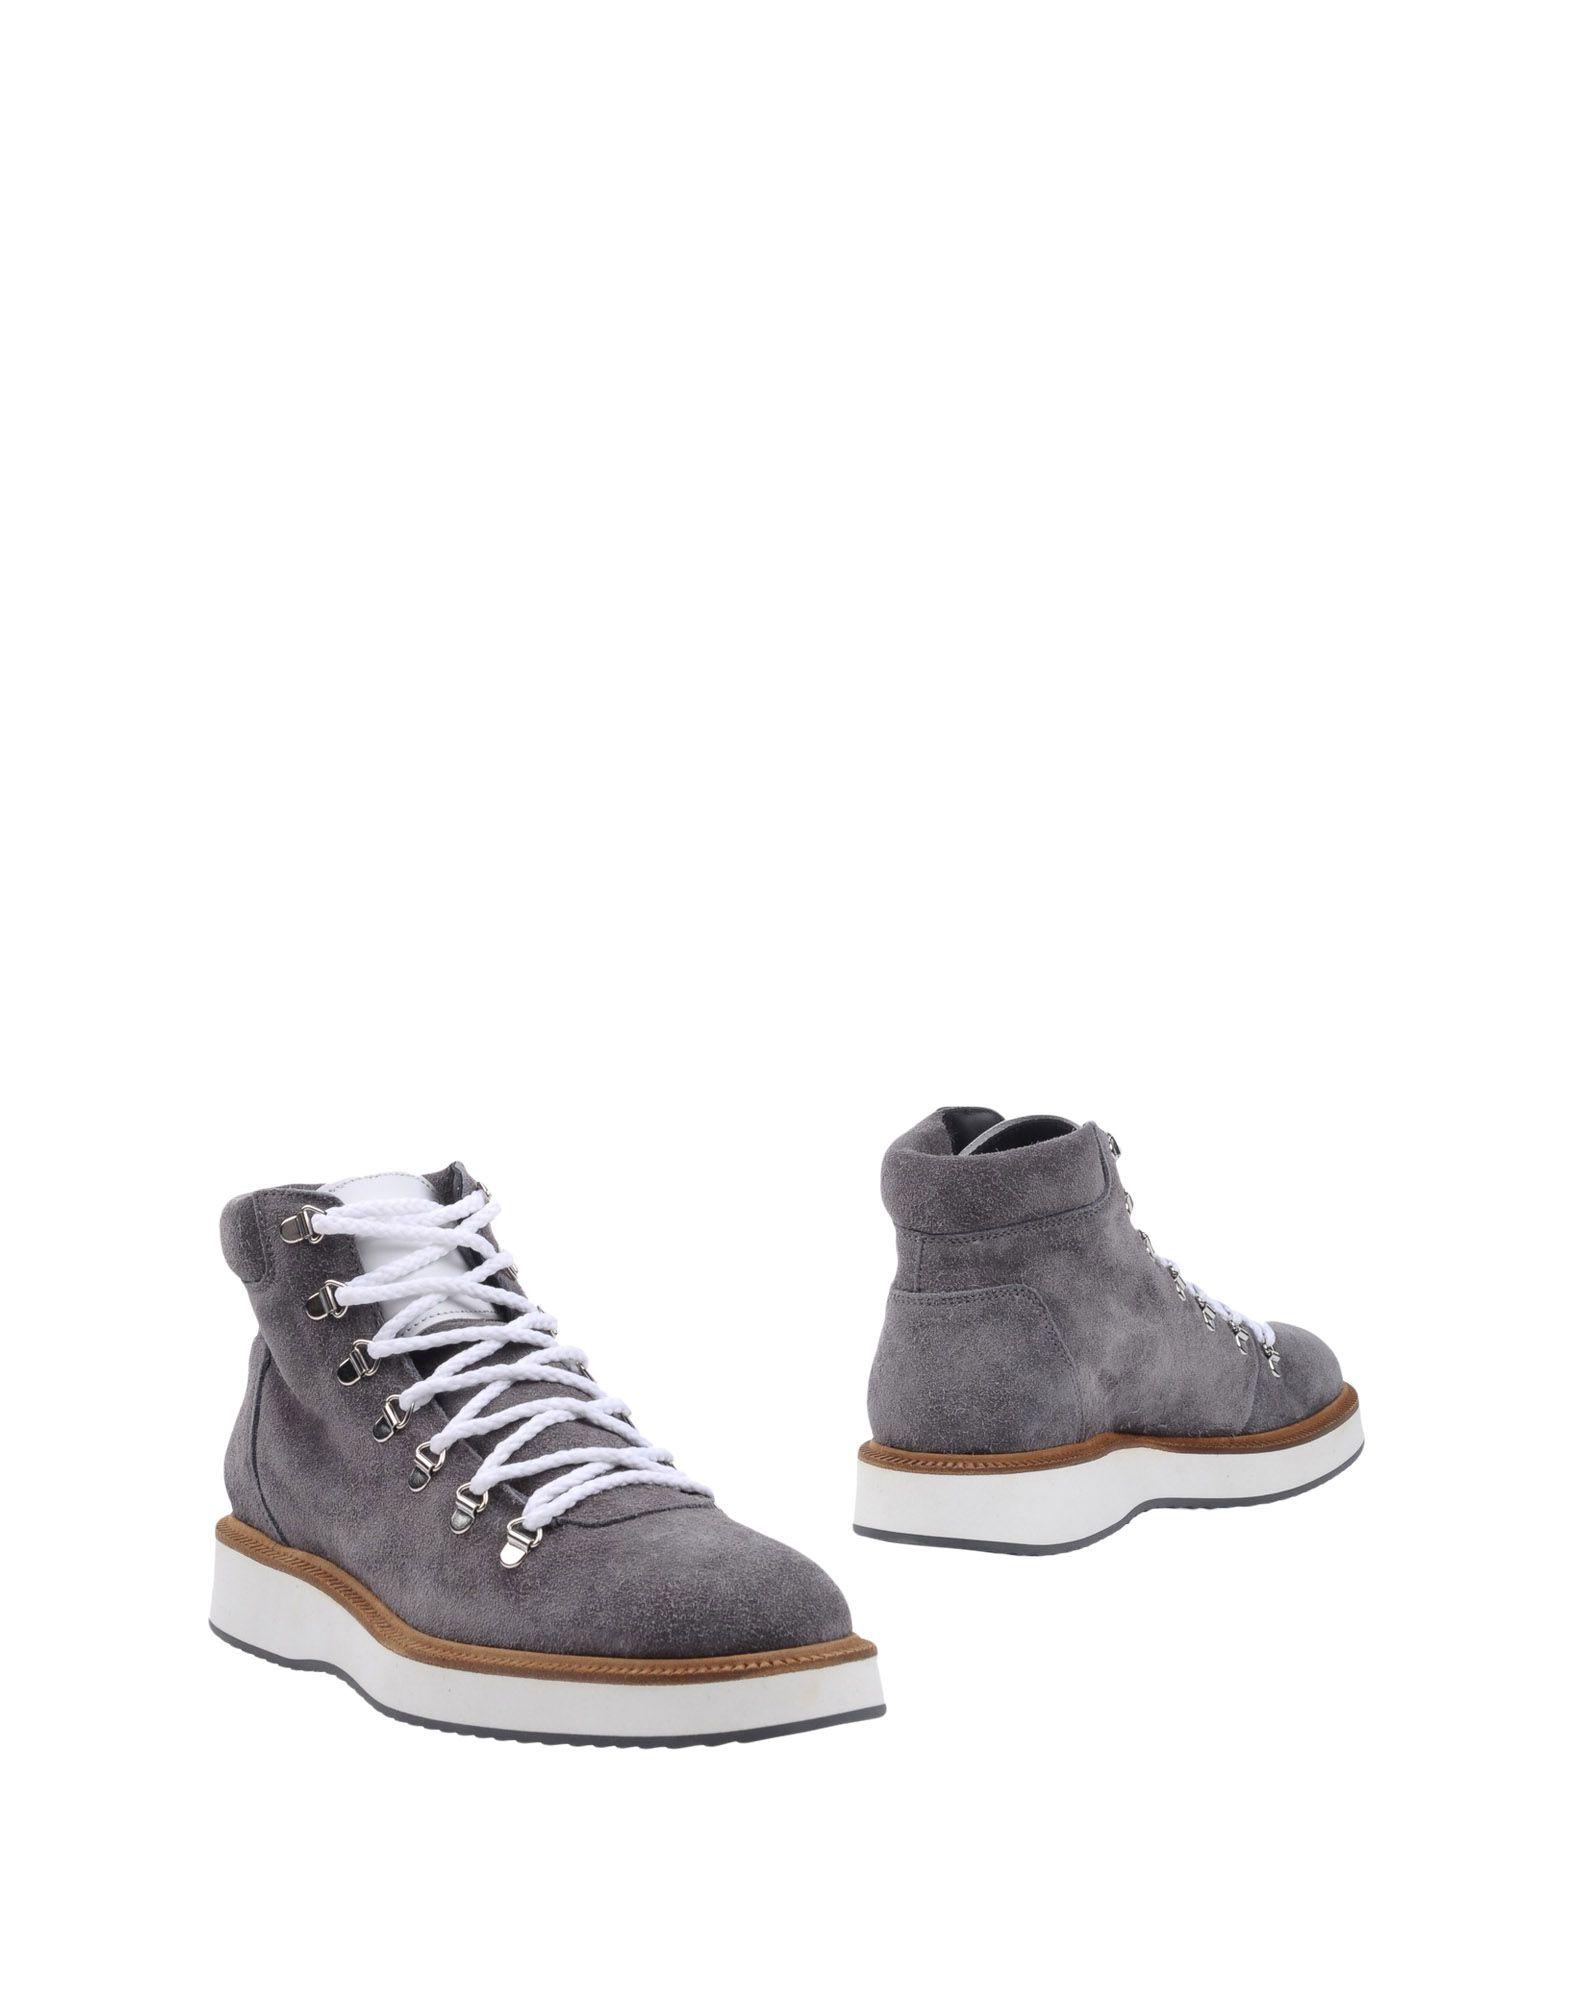 HOGAN Полусапоги и высокие ботинки 2225066030 high quality maf 22250 66030 mass air flow sensor for toyota 22250 66030 22250 66010